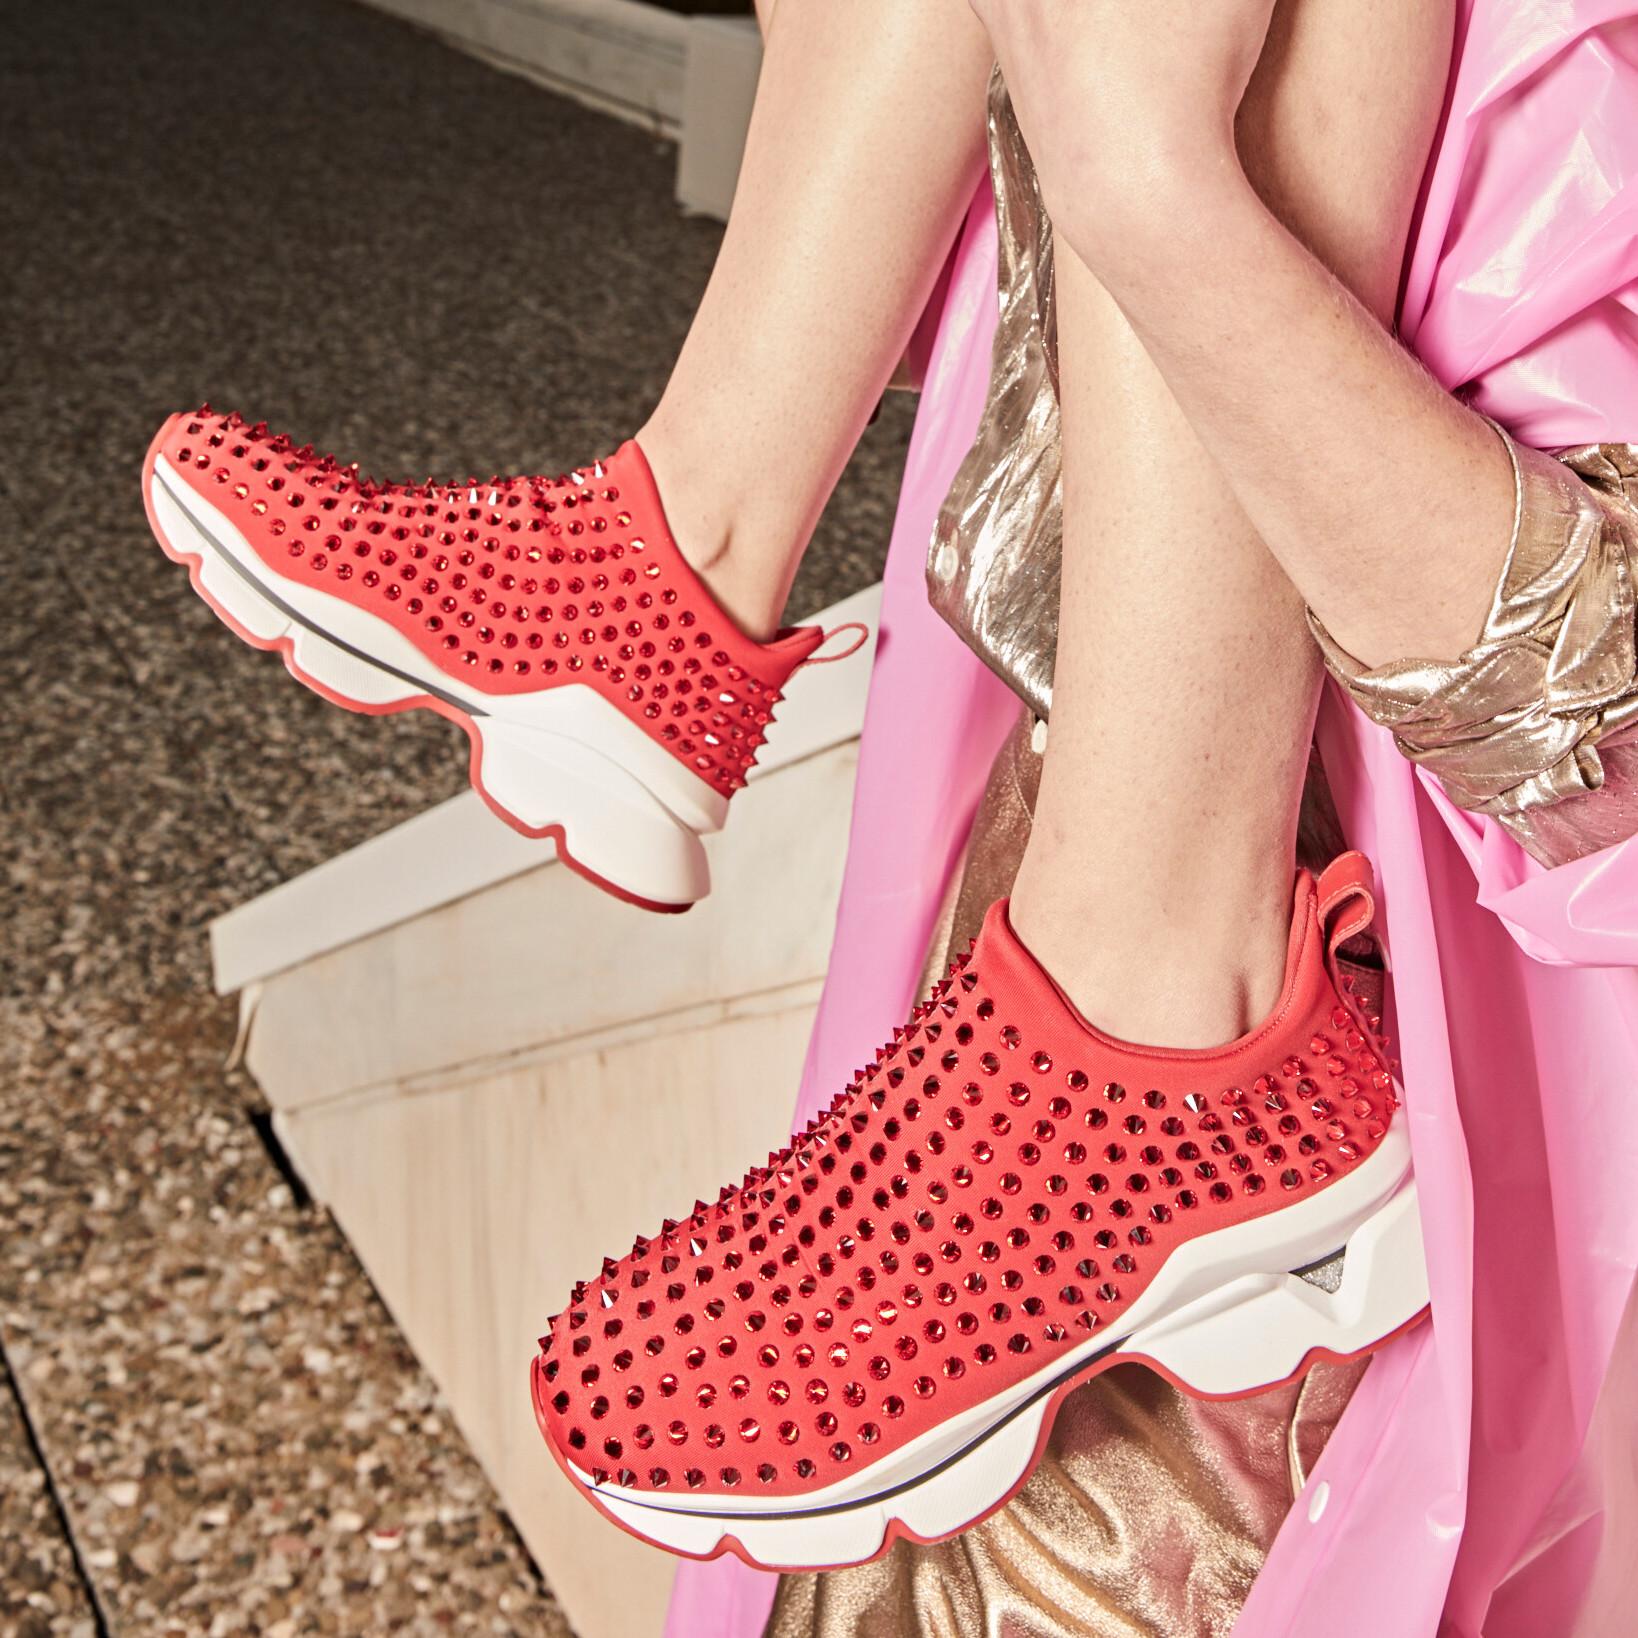 Christian Louboutin Krystal Sock Donna Neoprene Crystal Spikes In Red